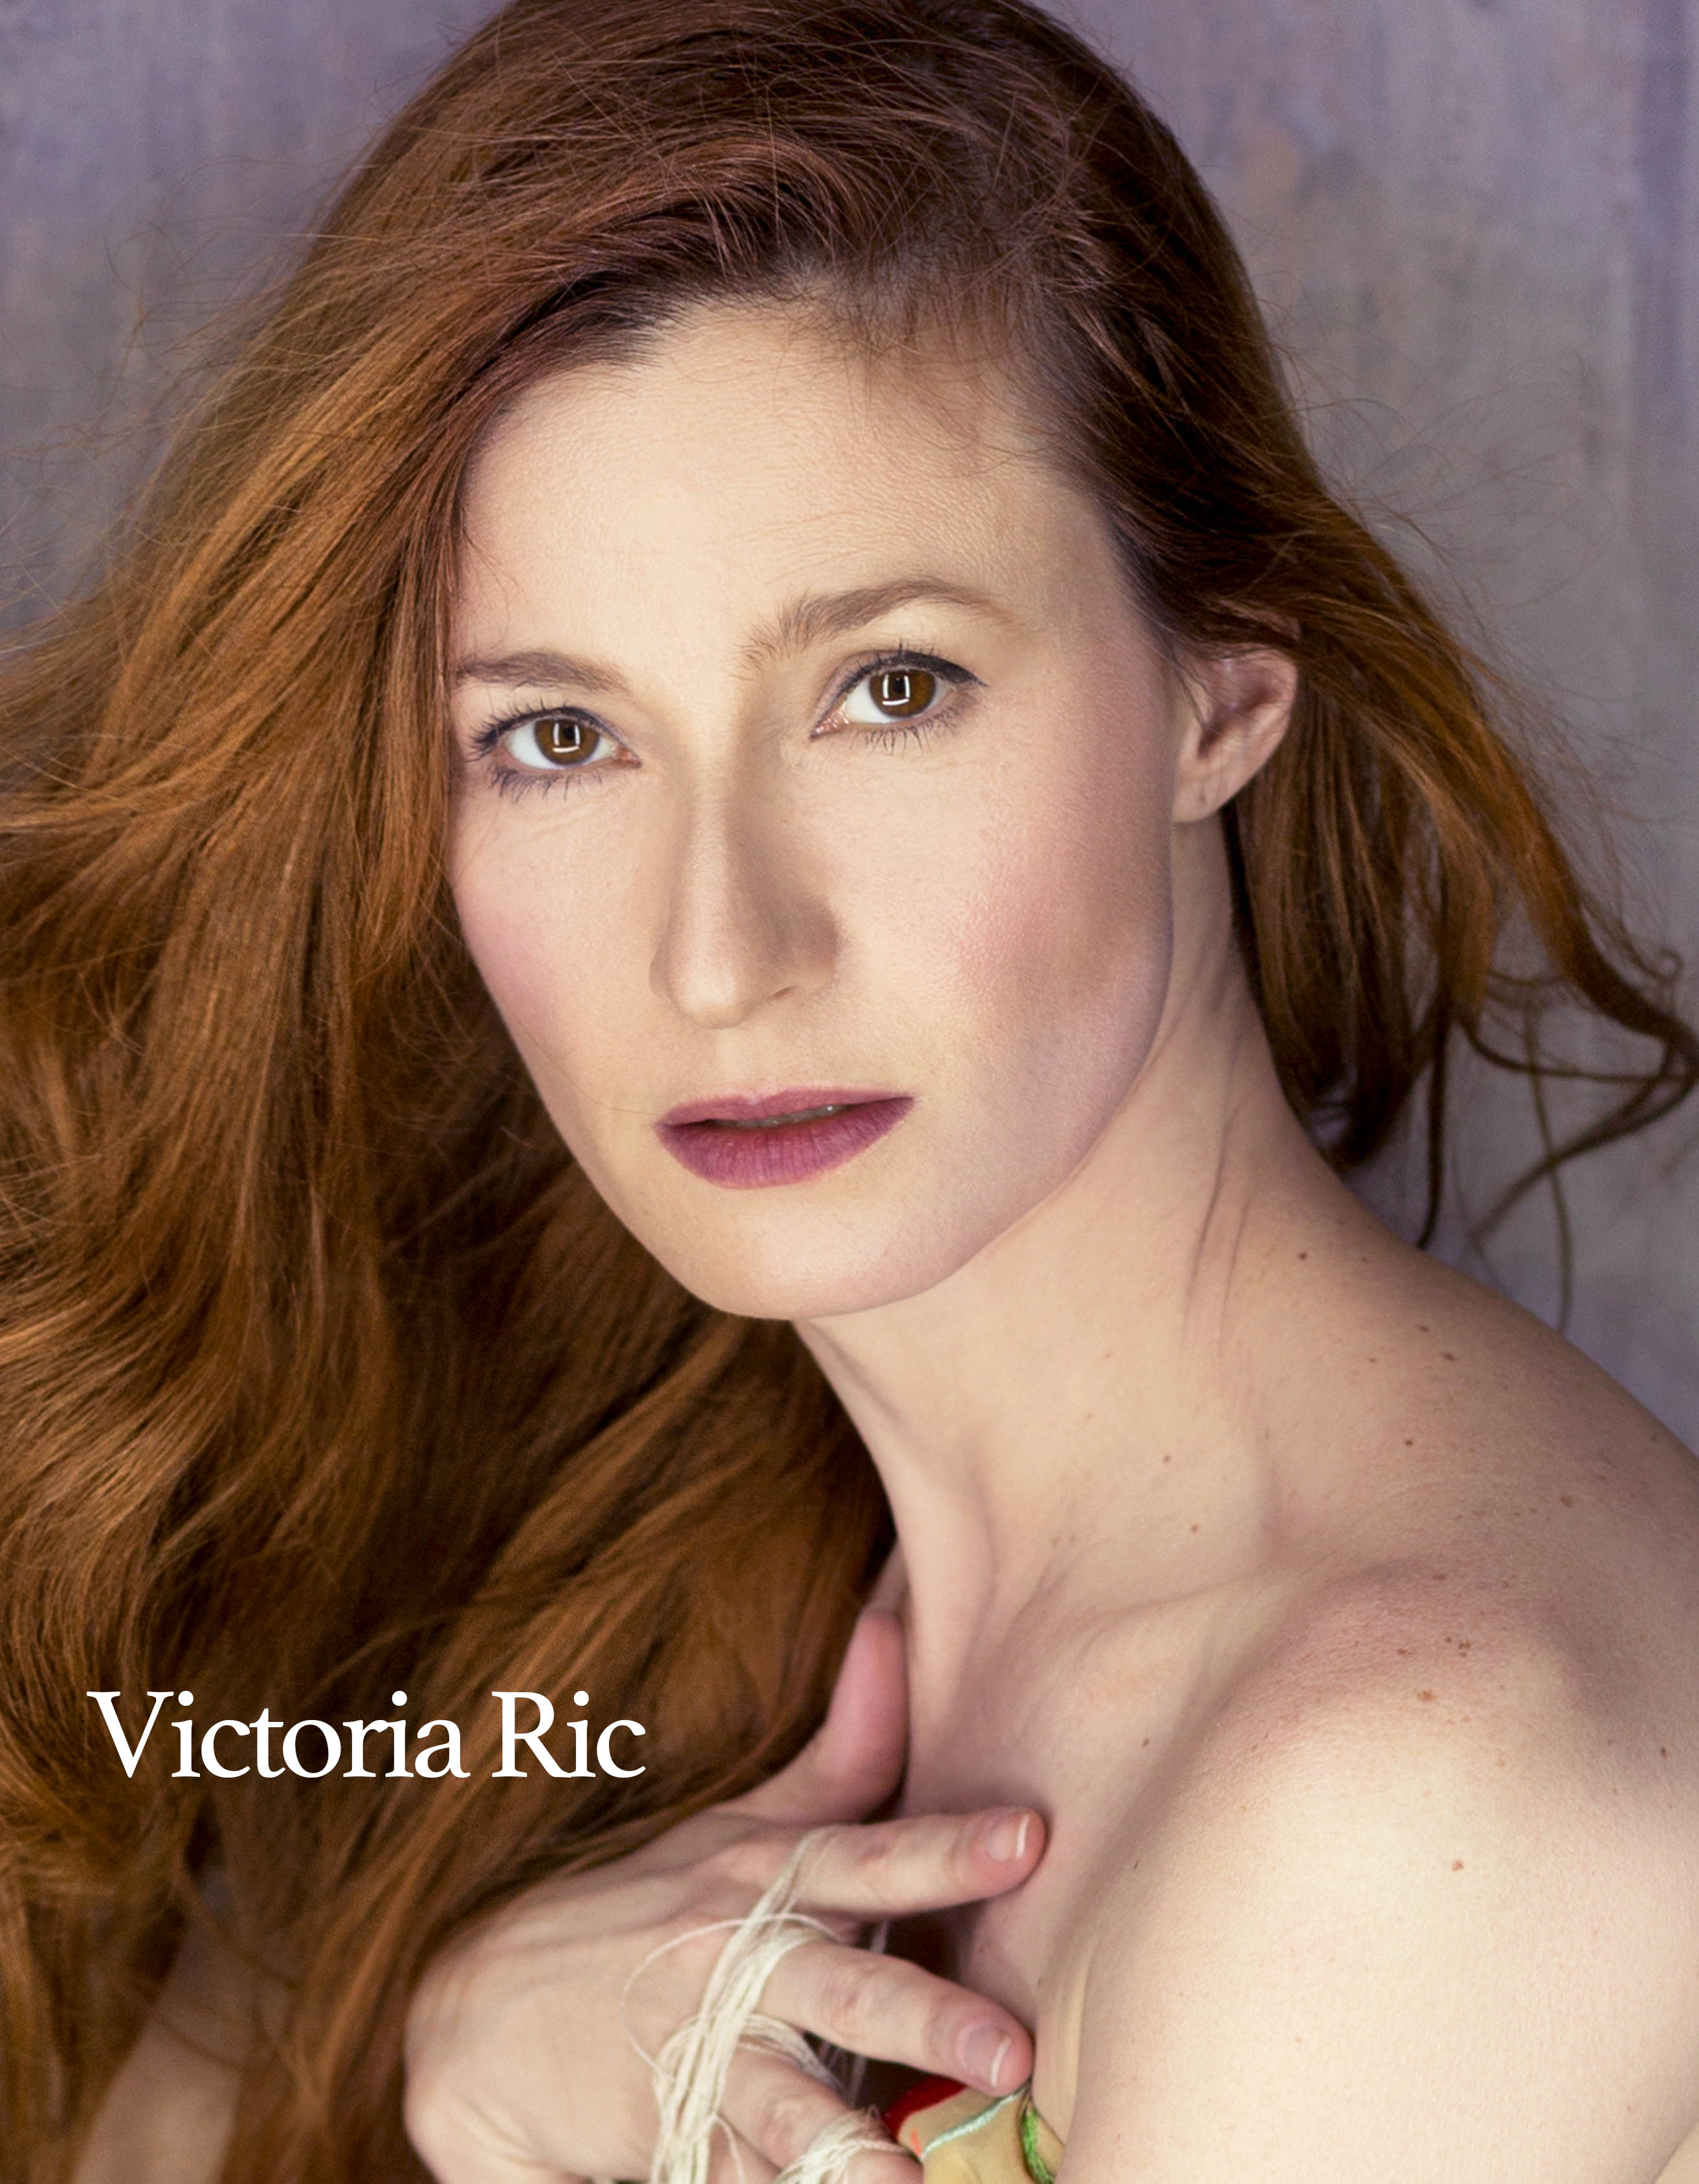 Victoria Ric